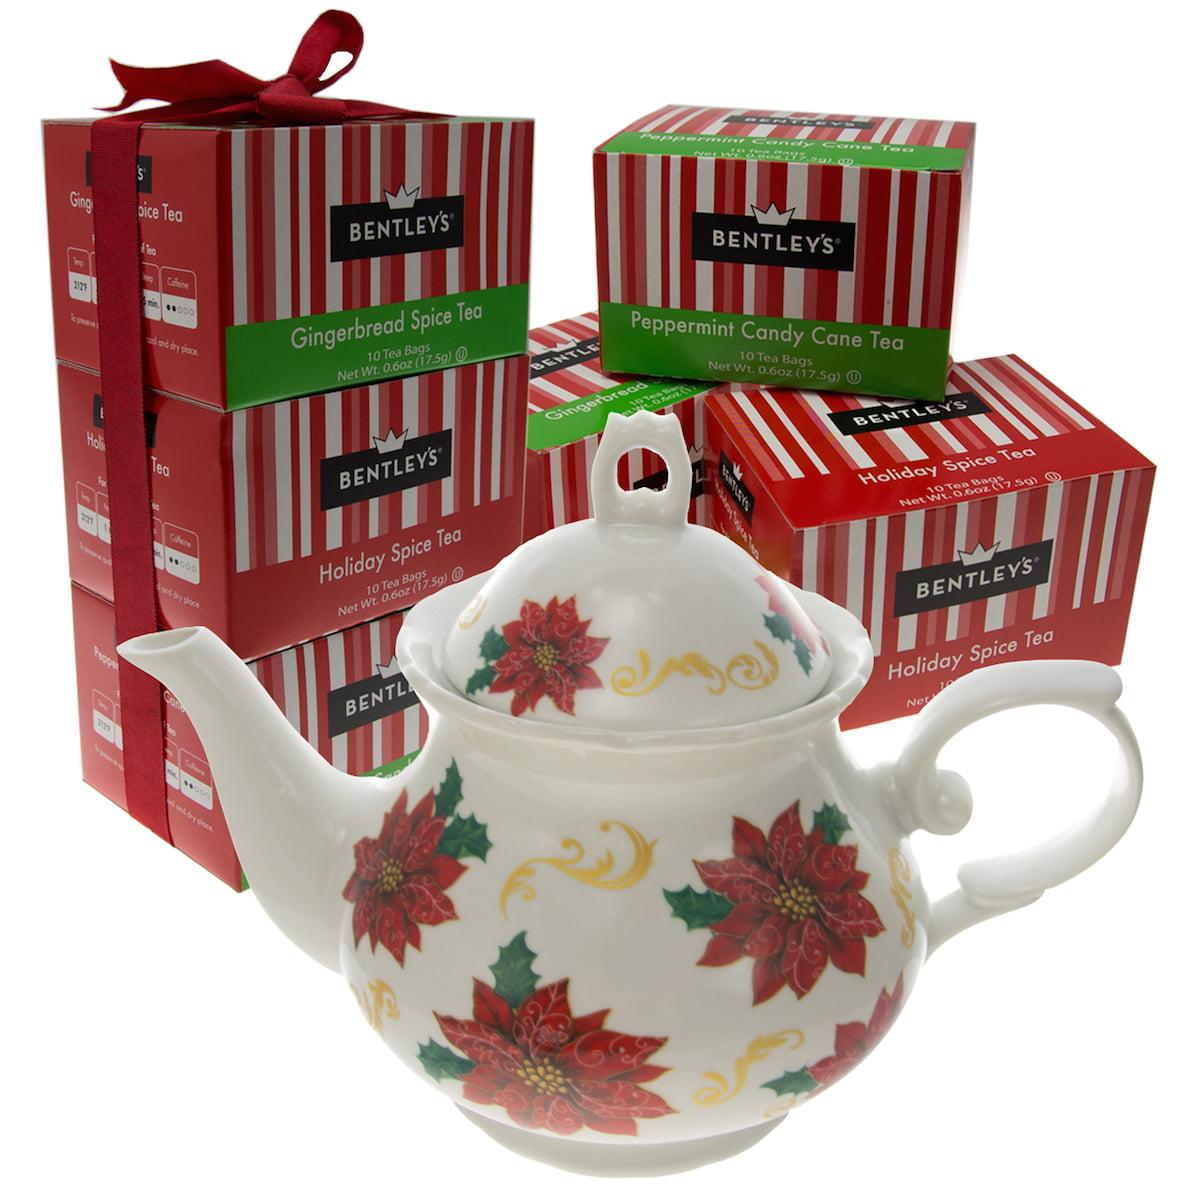 Bentley's Bulk Lot Gift Set of 6 Boxes Black Tea Bags & White Ceramic Porcelain Flower Pattern Teapot Christmas